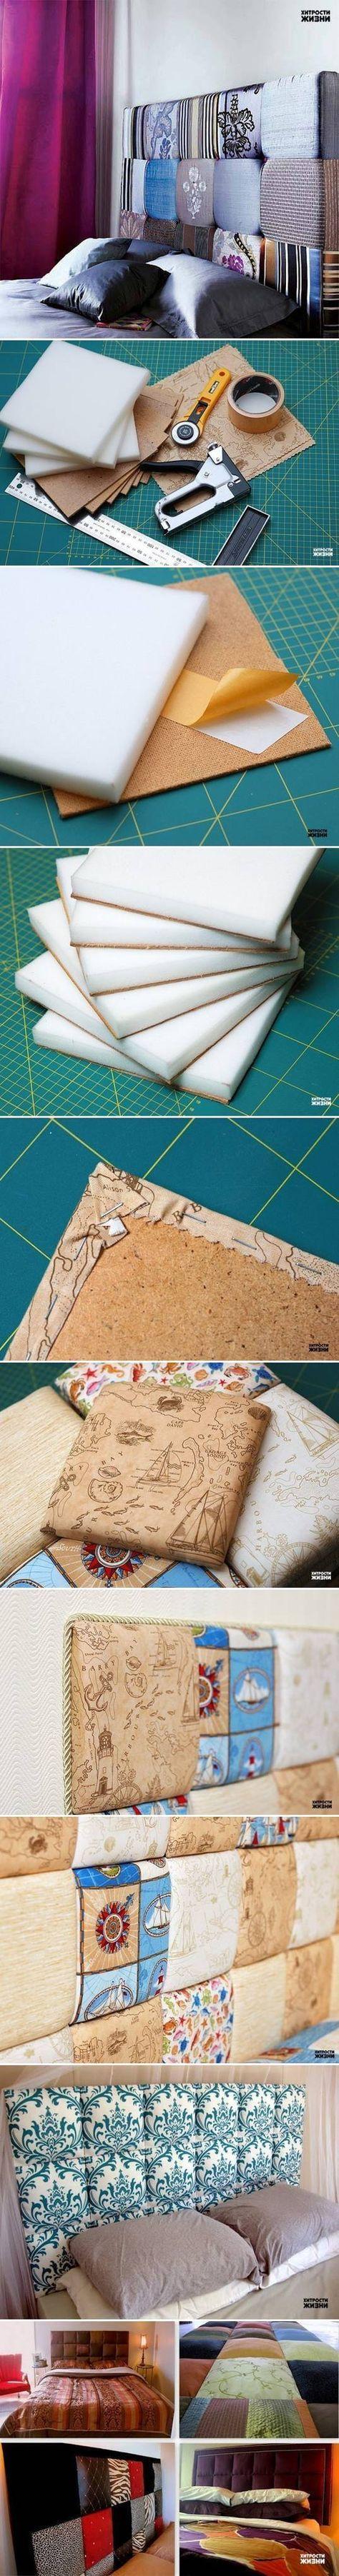 DIY Soft Cama Cabecera DIY Proyectos | UsefulDIY.com